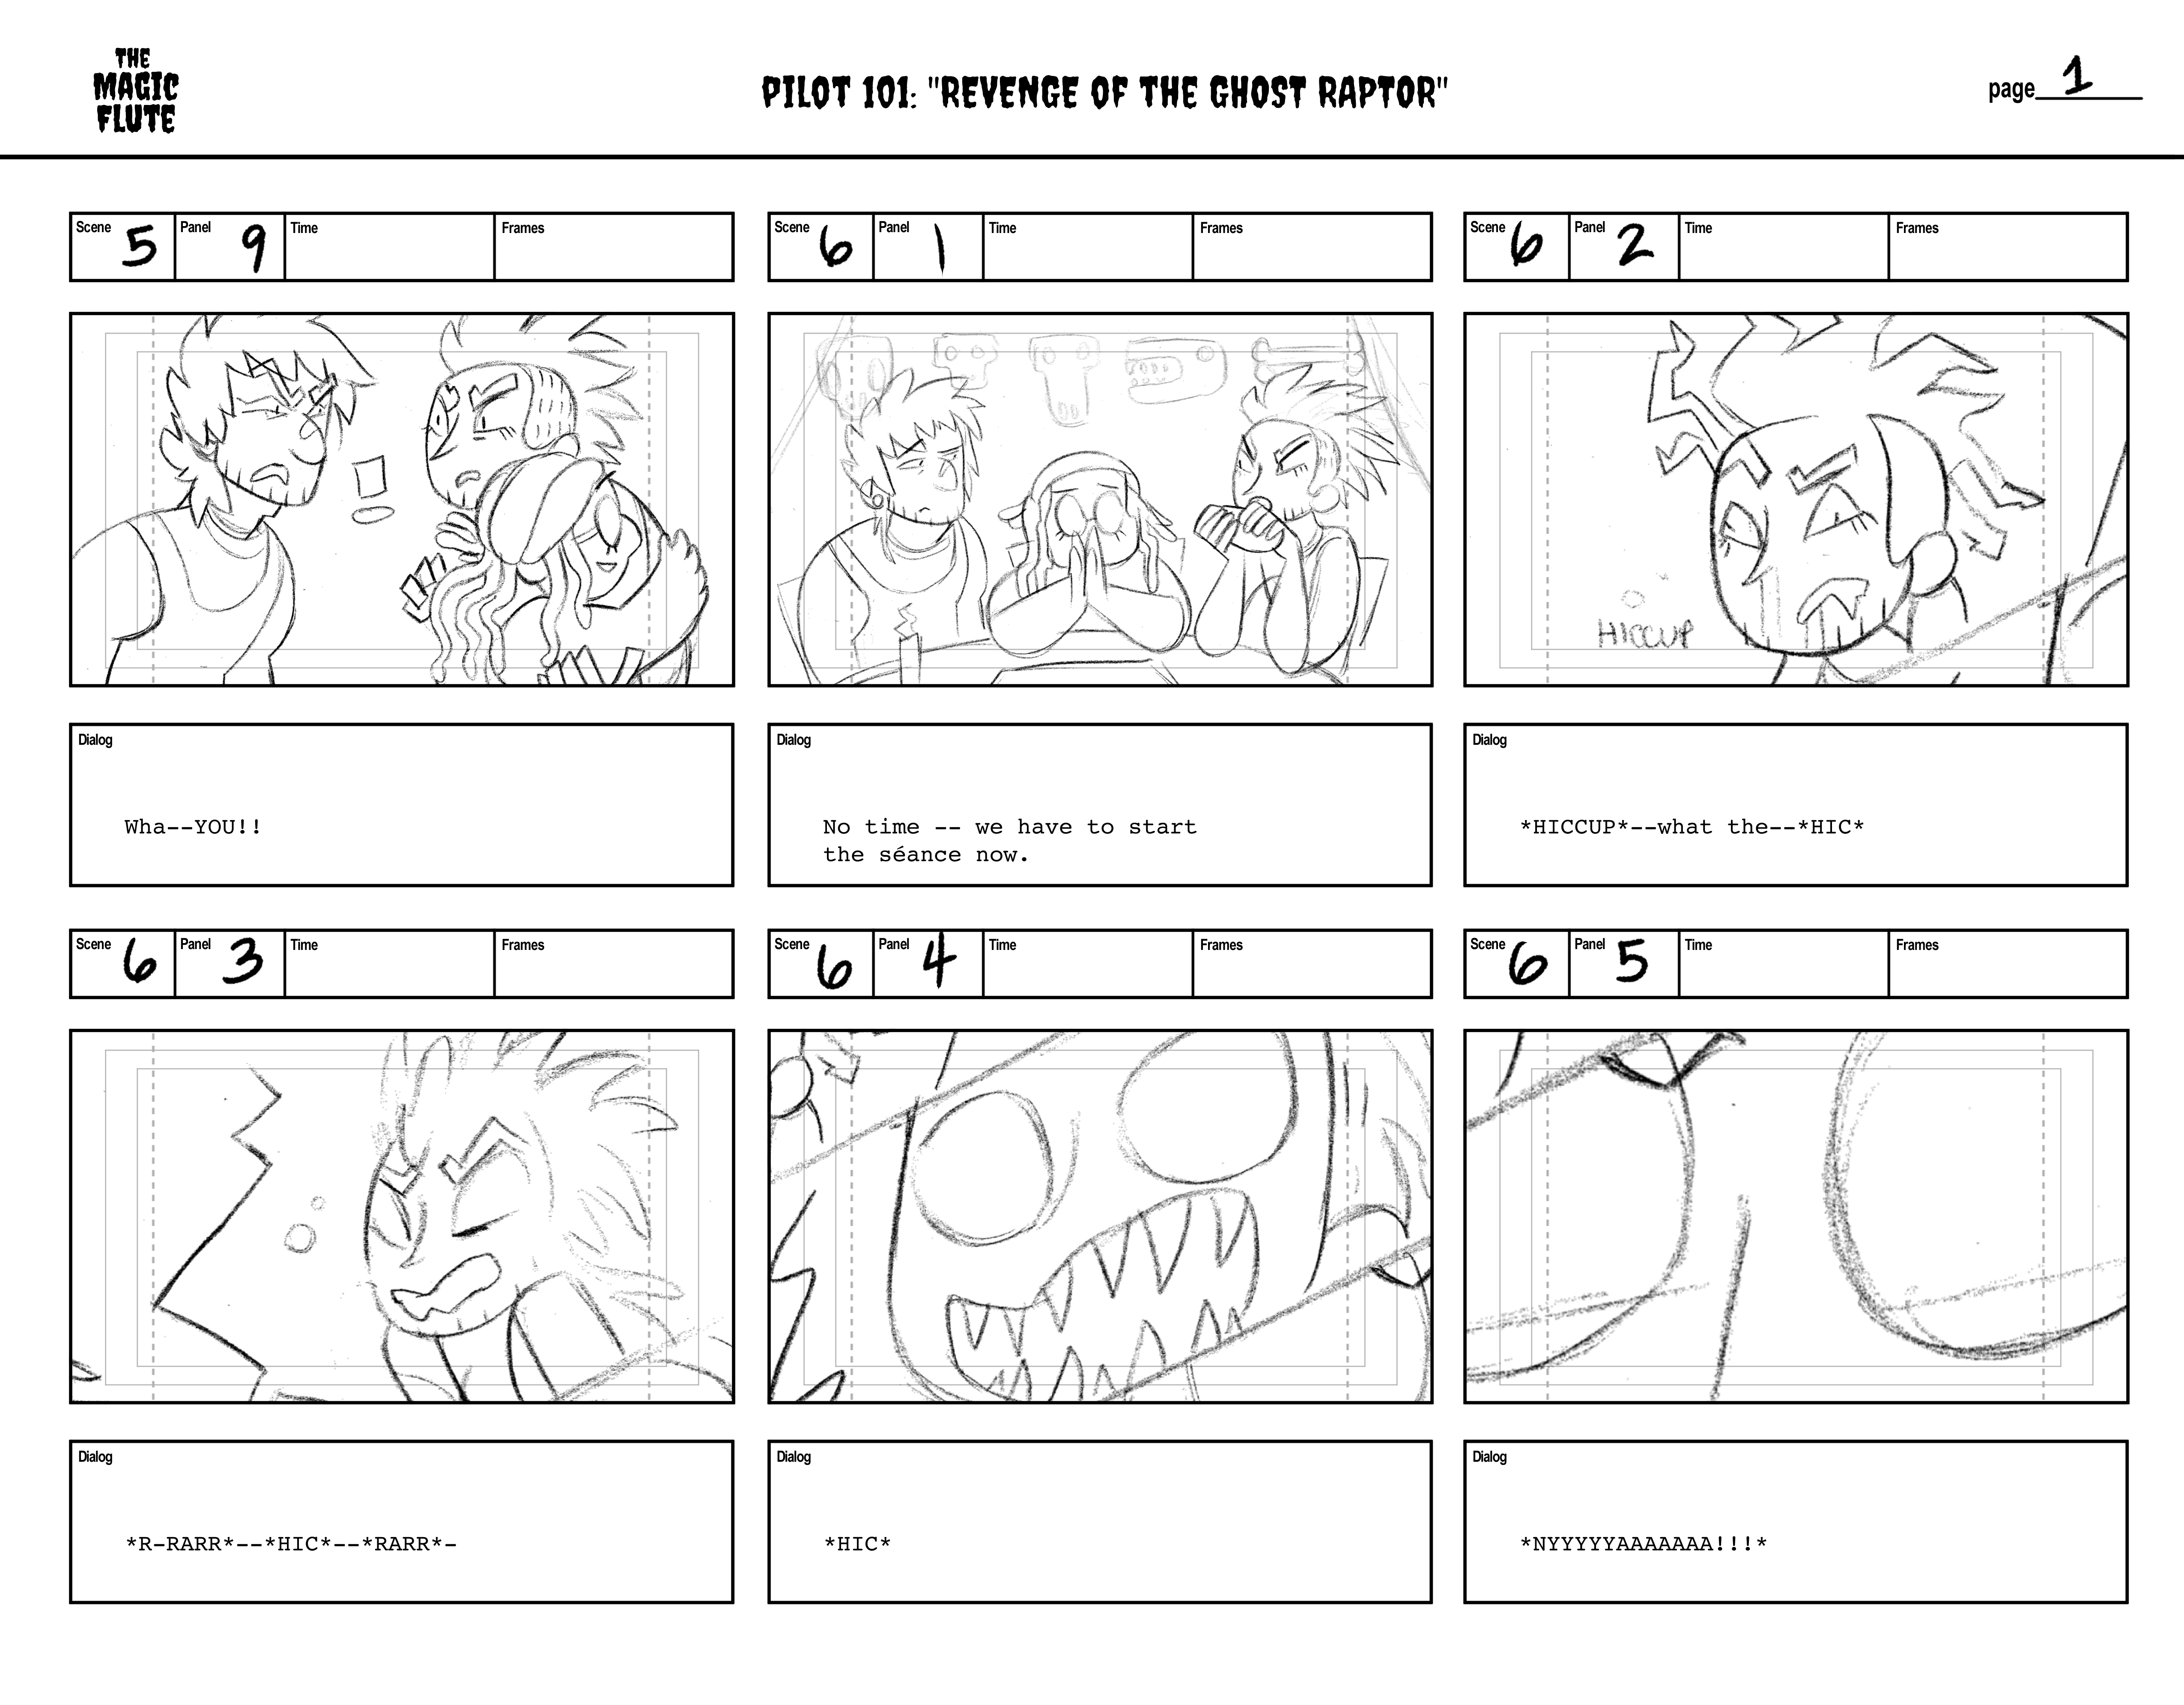 Storyboards 1-6